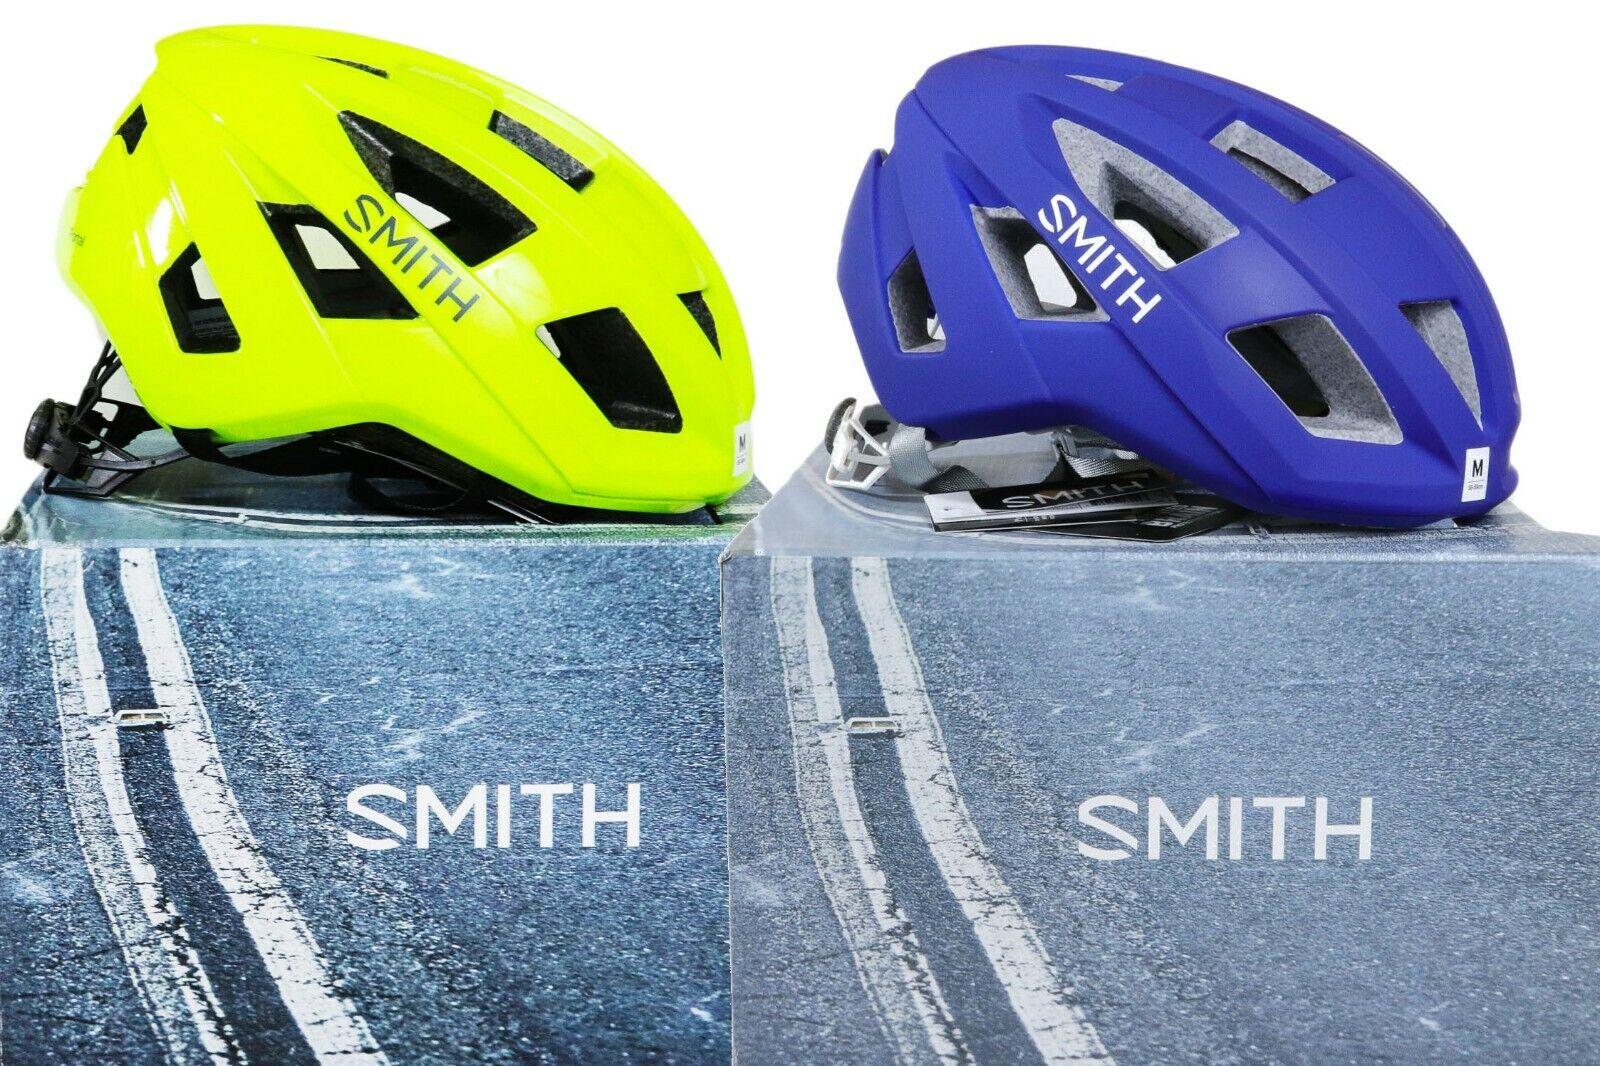 nouveau smith mips bicycle helmet portal choose your colour and Taille-bleu